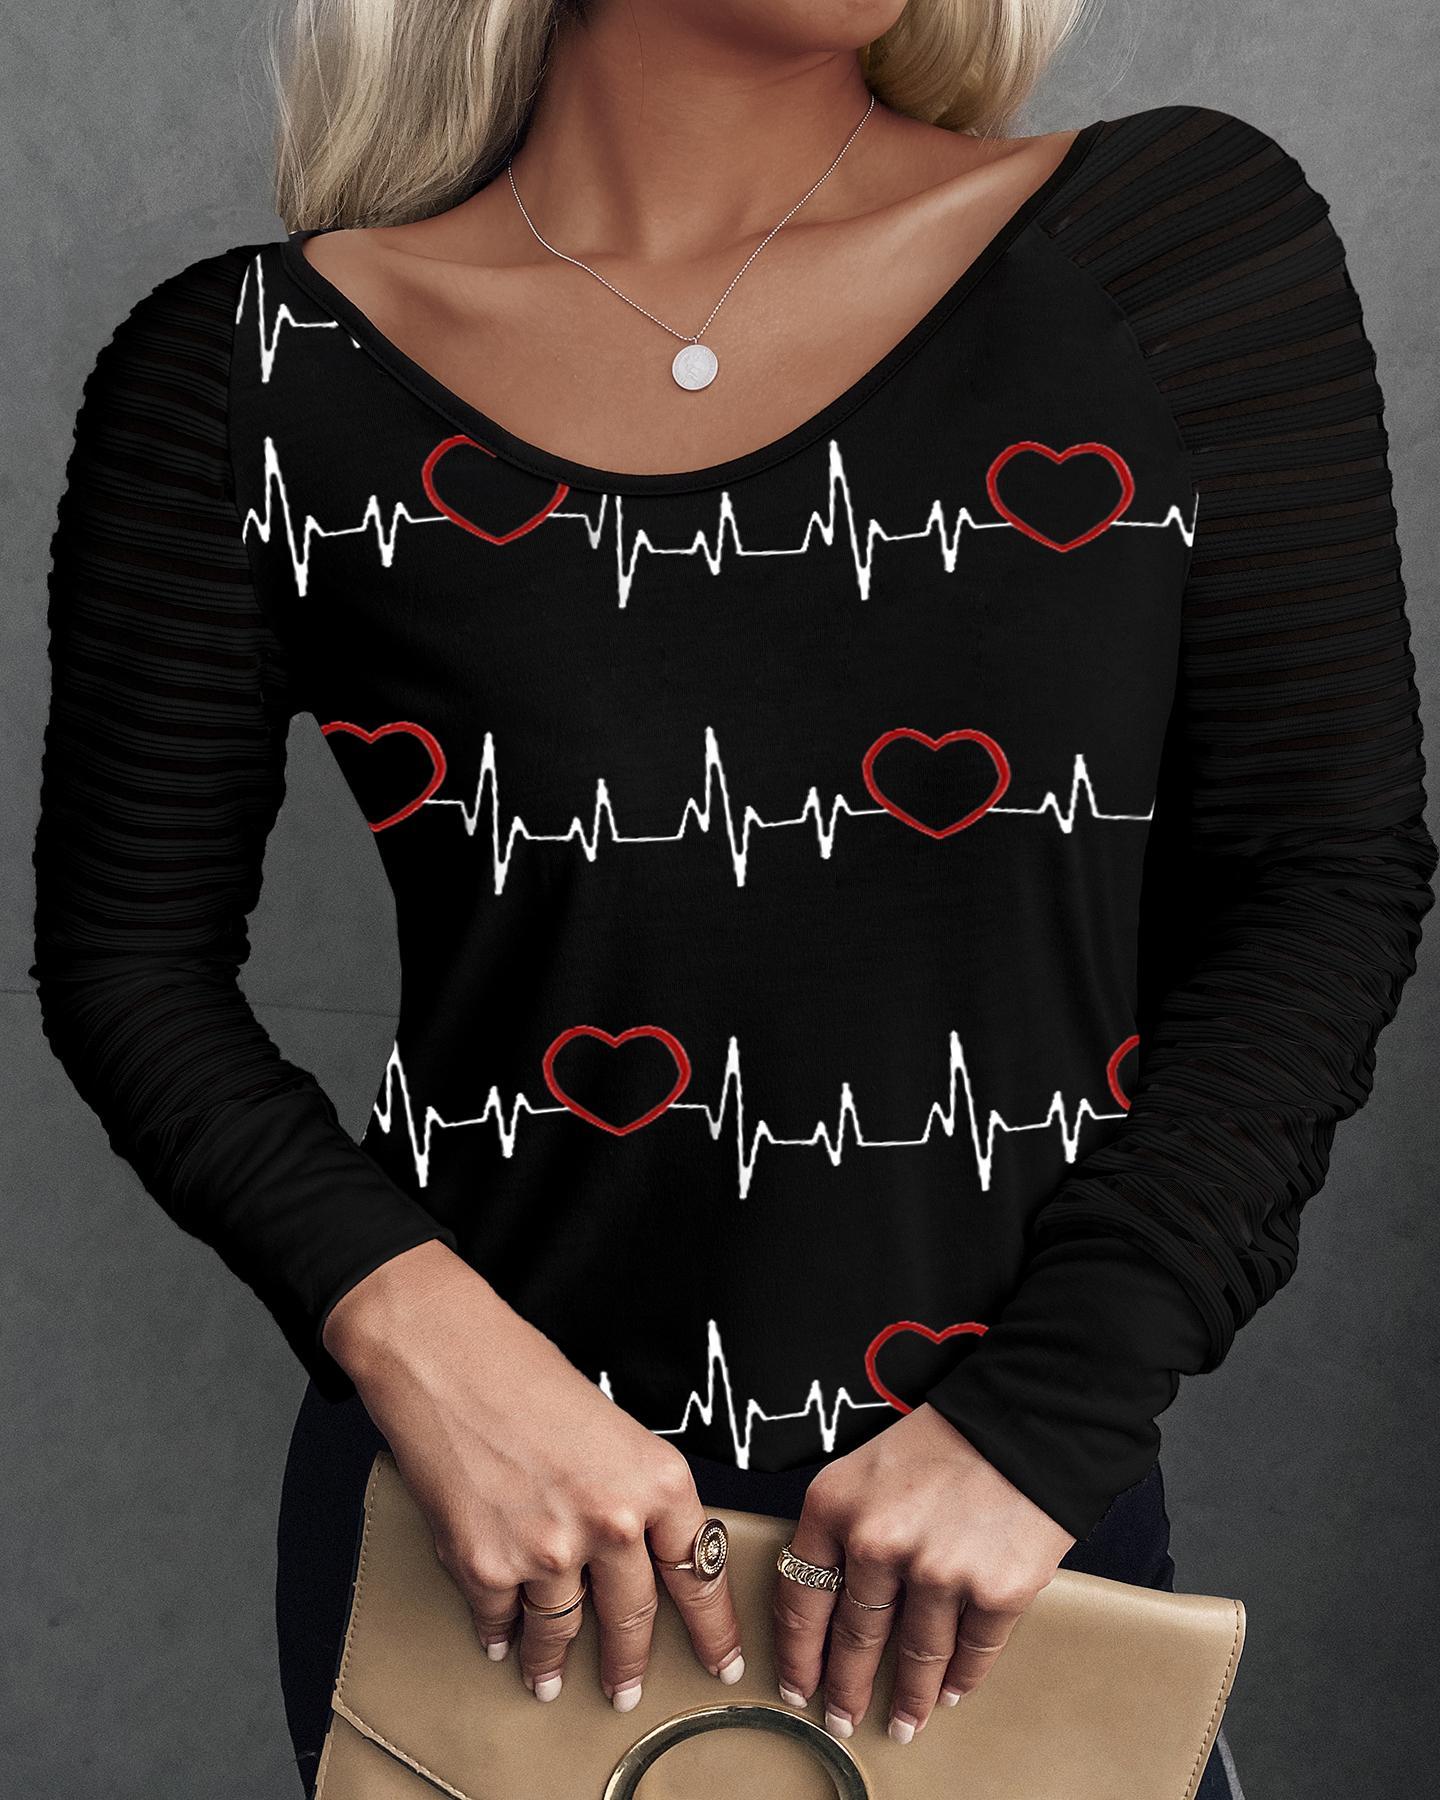 Heart Print V-Neck Long Sleeve Top